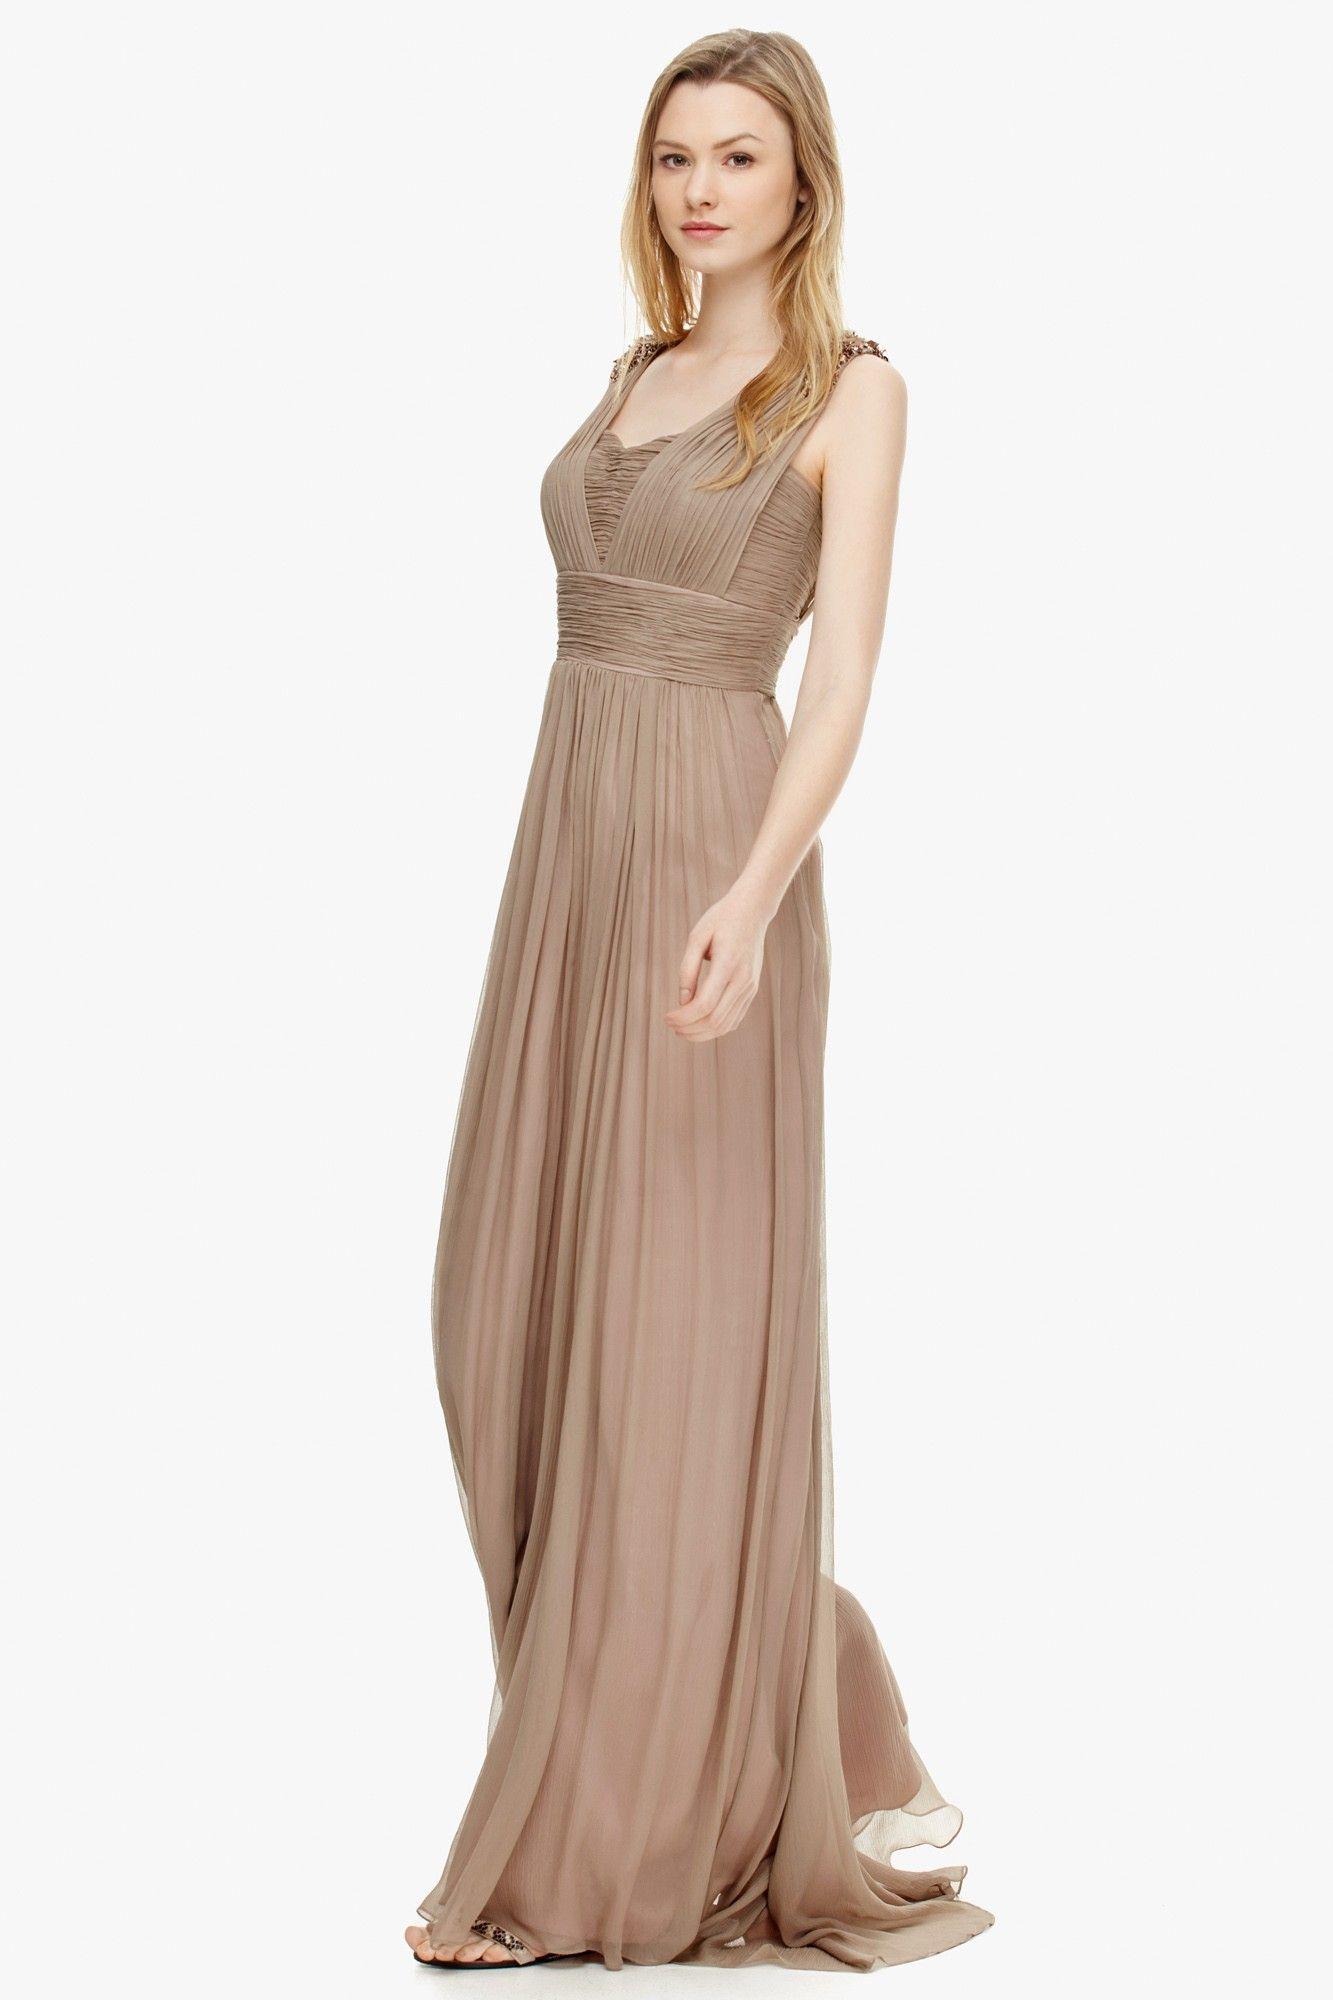 Shop Online Abiti Eleganti.Greek Style Silk Gown Dresses Adolfo Dominguez Shop Online